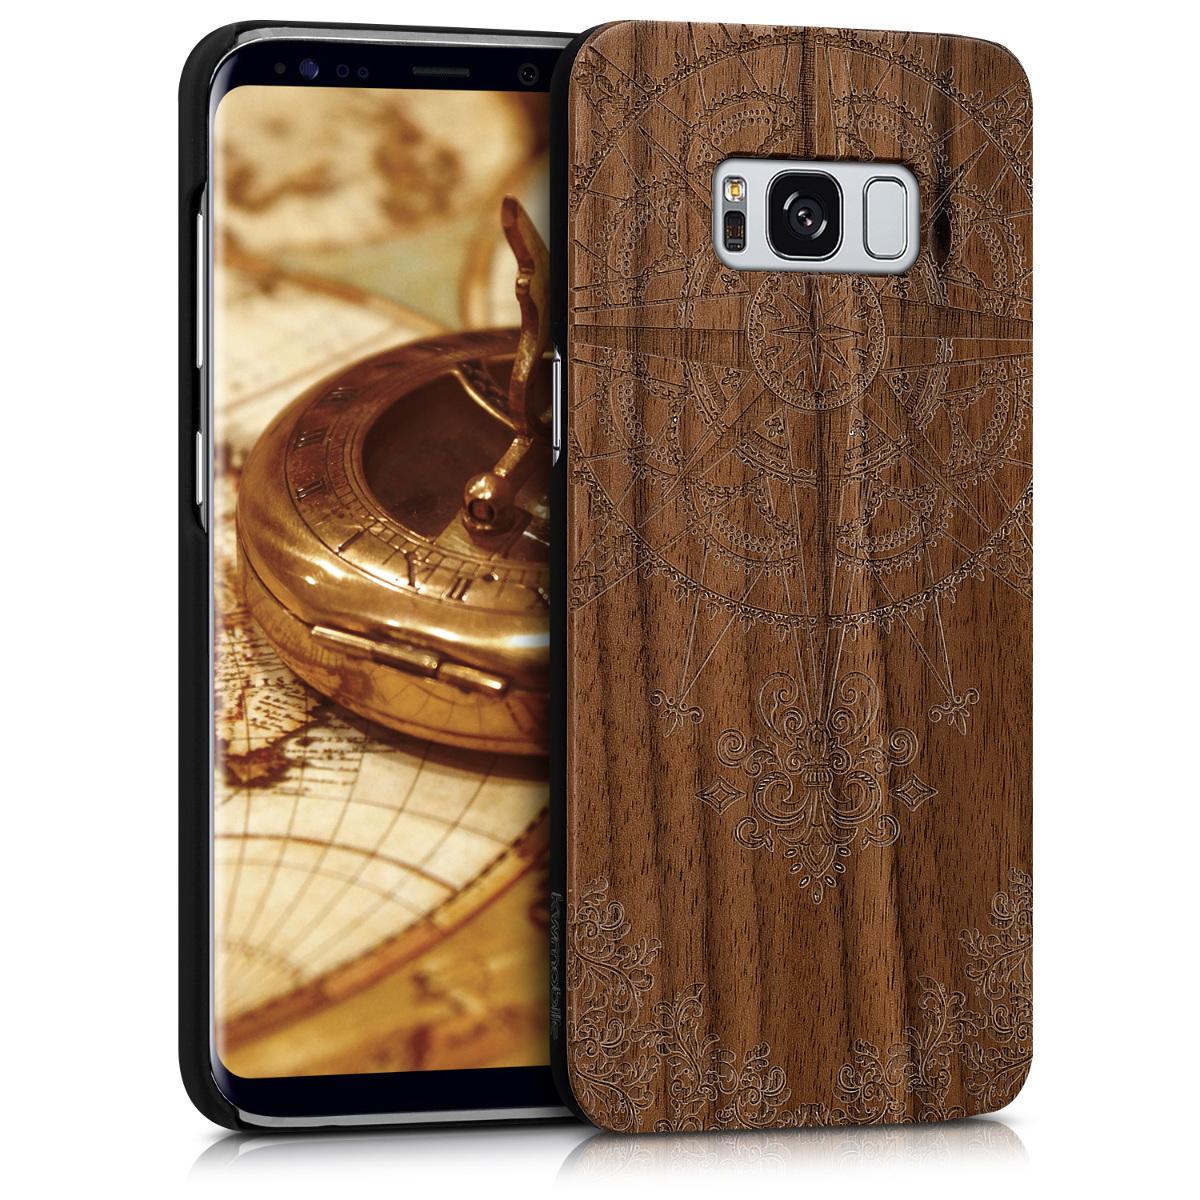 KW Σκληρή Ξύλινη Θήκη - Samsung Galaxy S8 - Brown (40979.02)